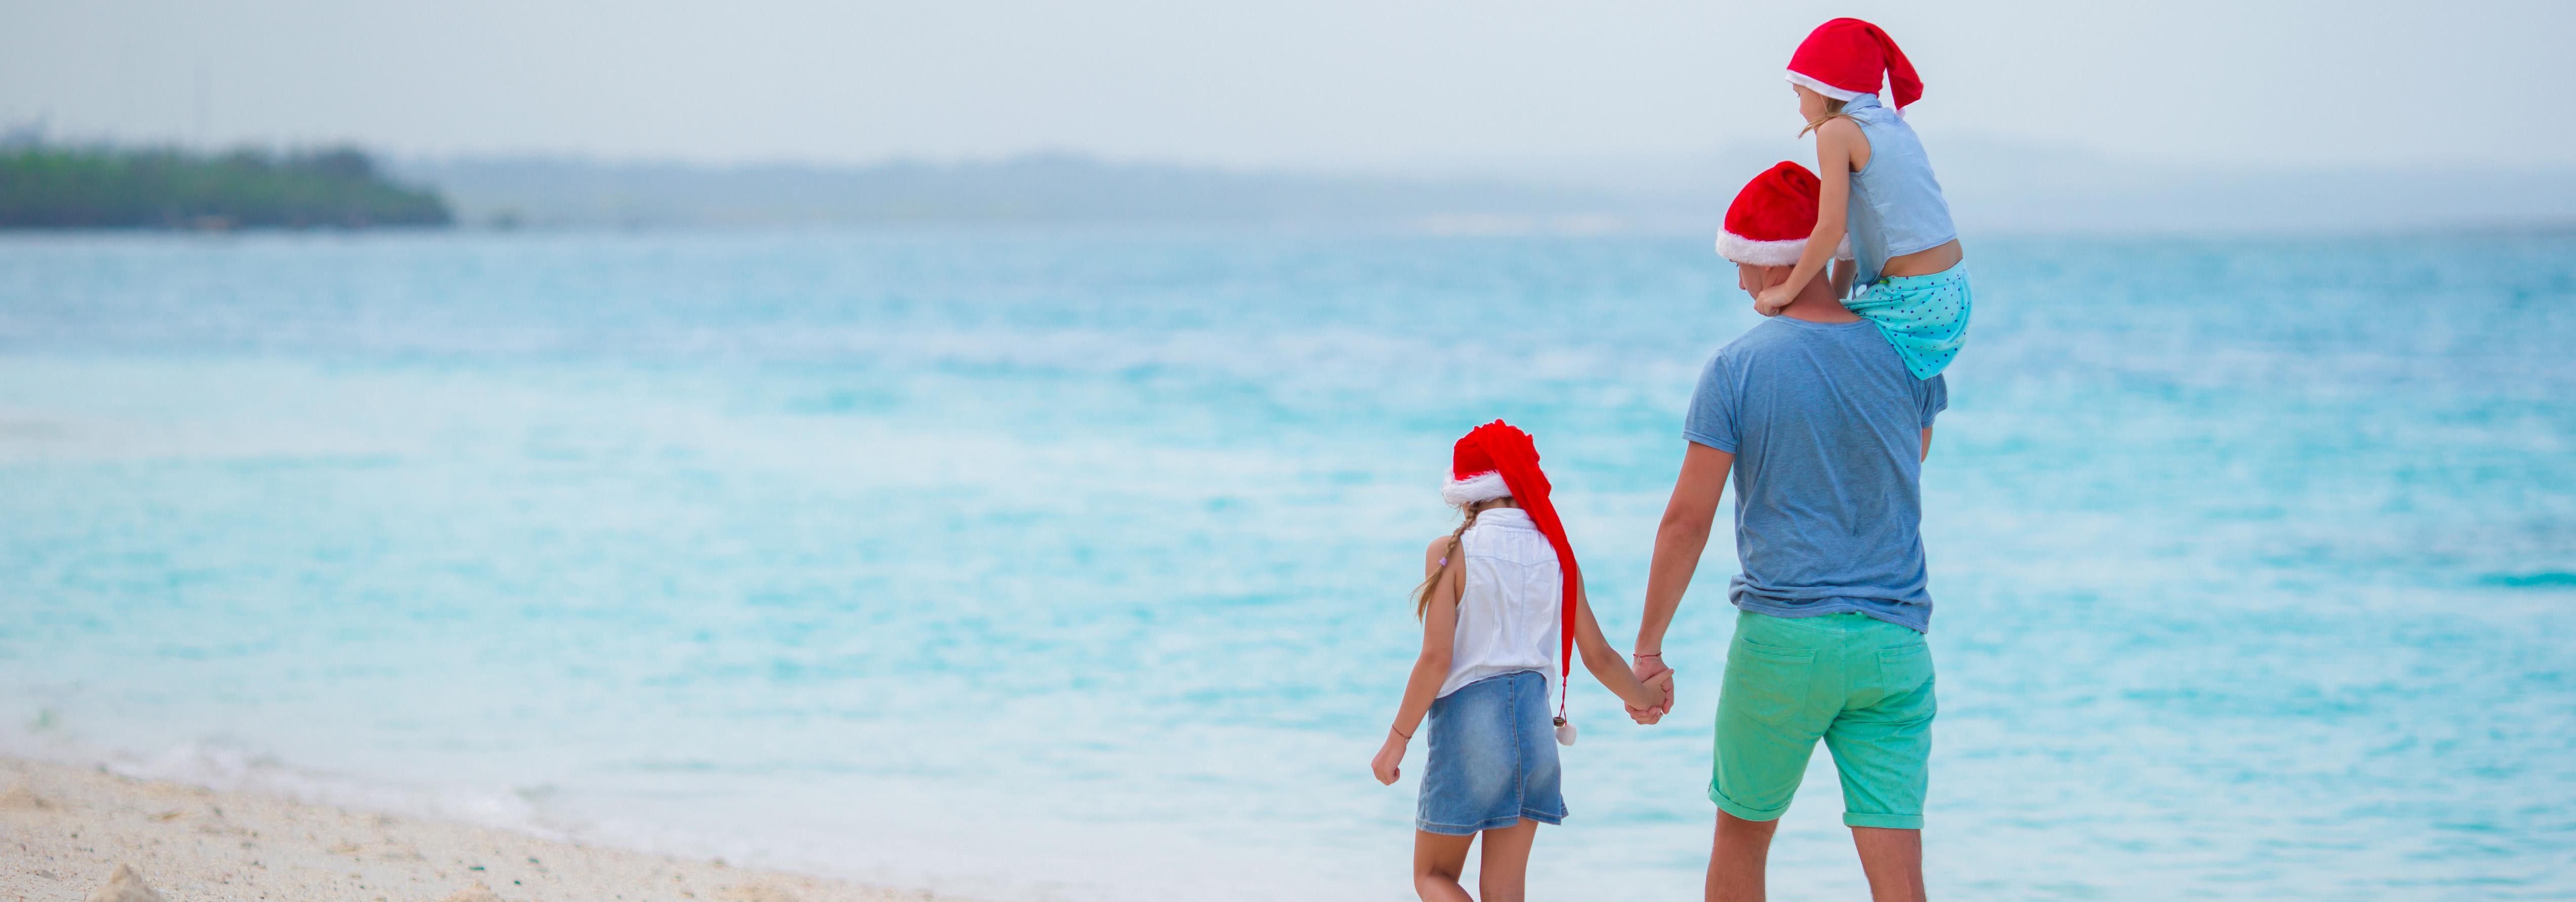 Christmas In Australia Santa.Christmas In Australia Sun Surf And Santa Australia Post